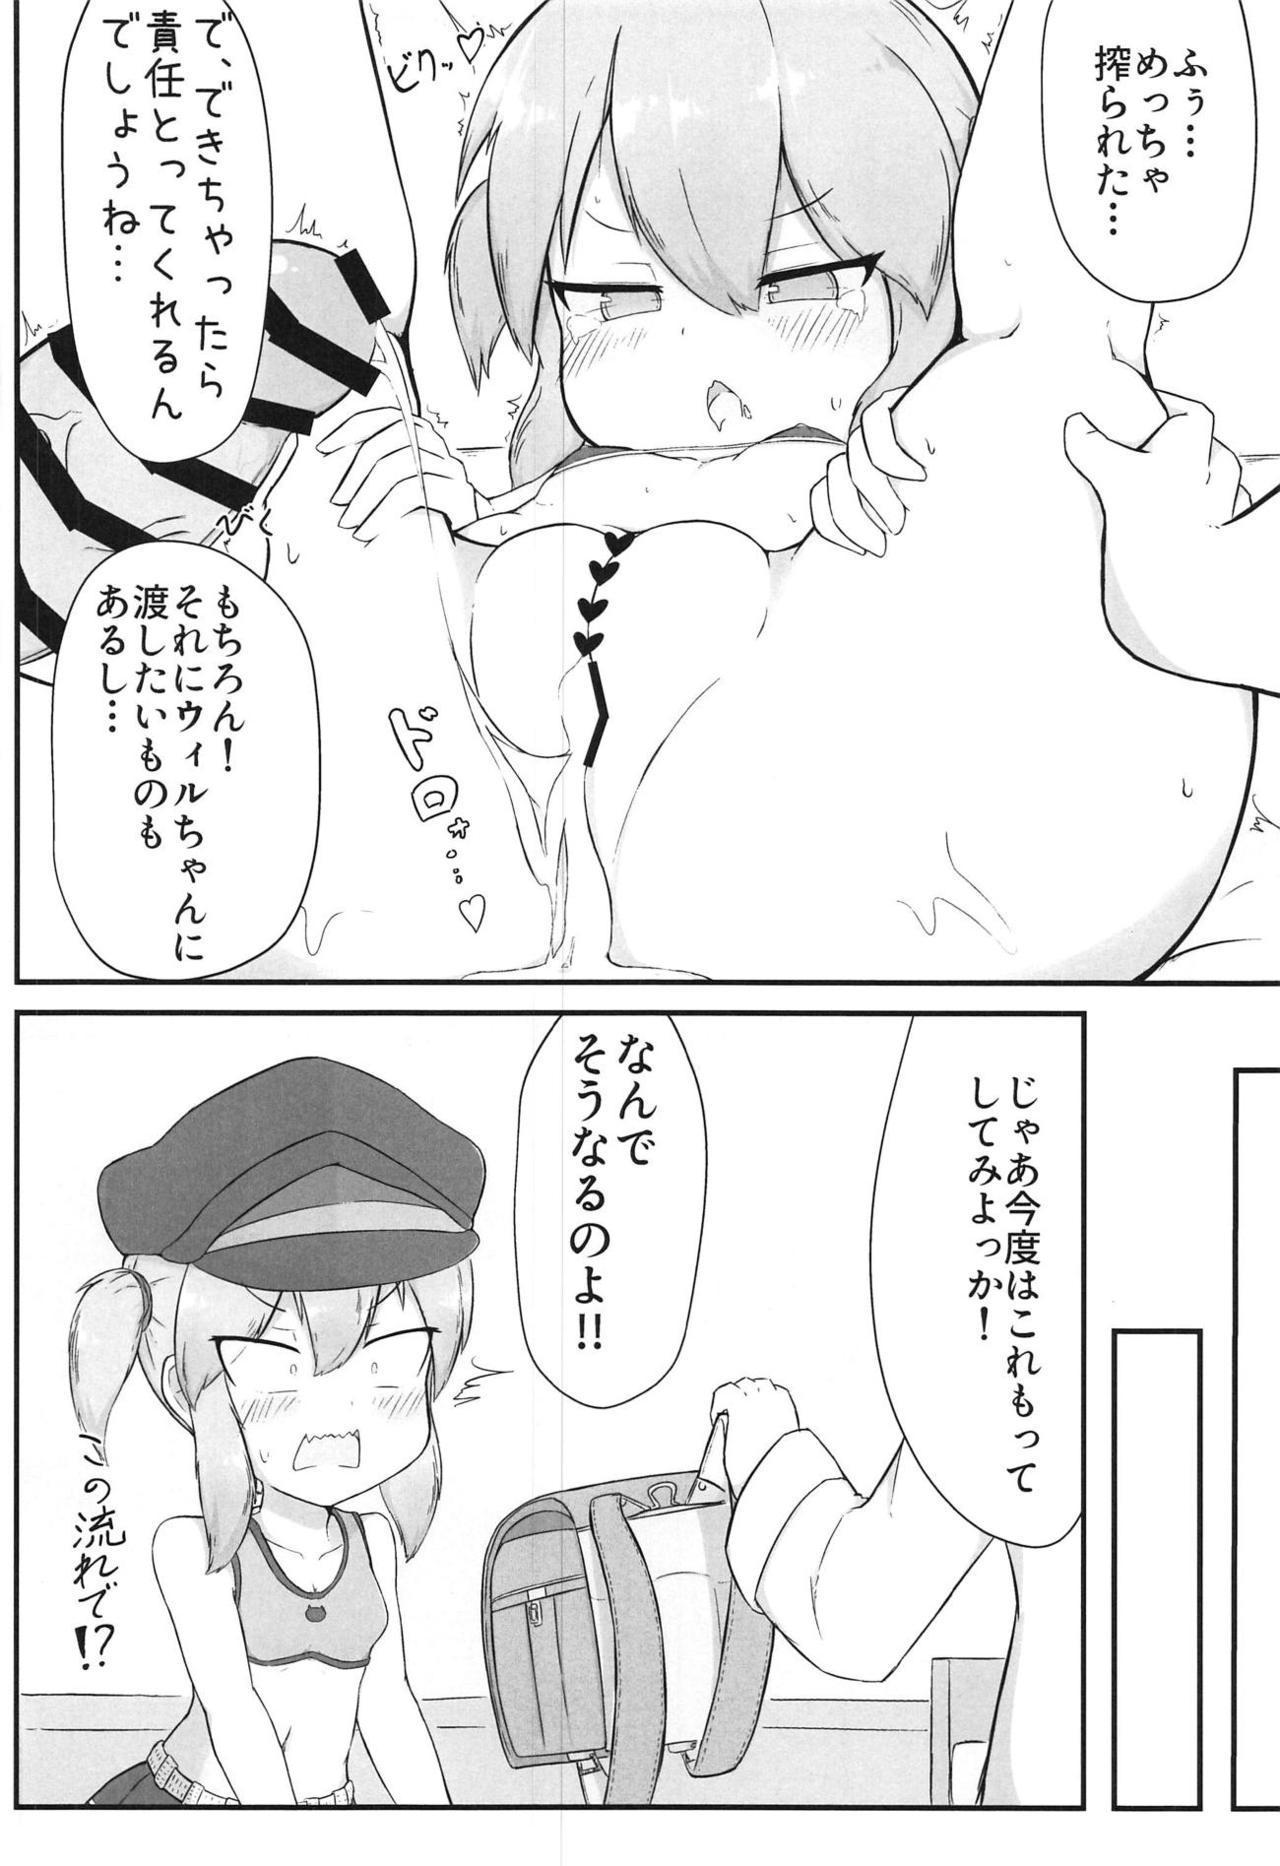 Wil-chan to Ecchi Suru Hon 16